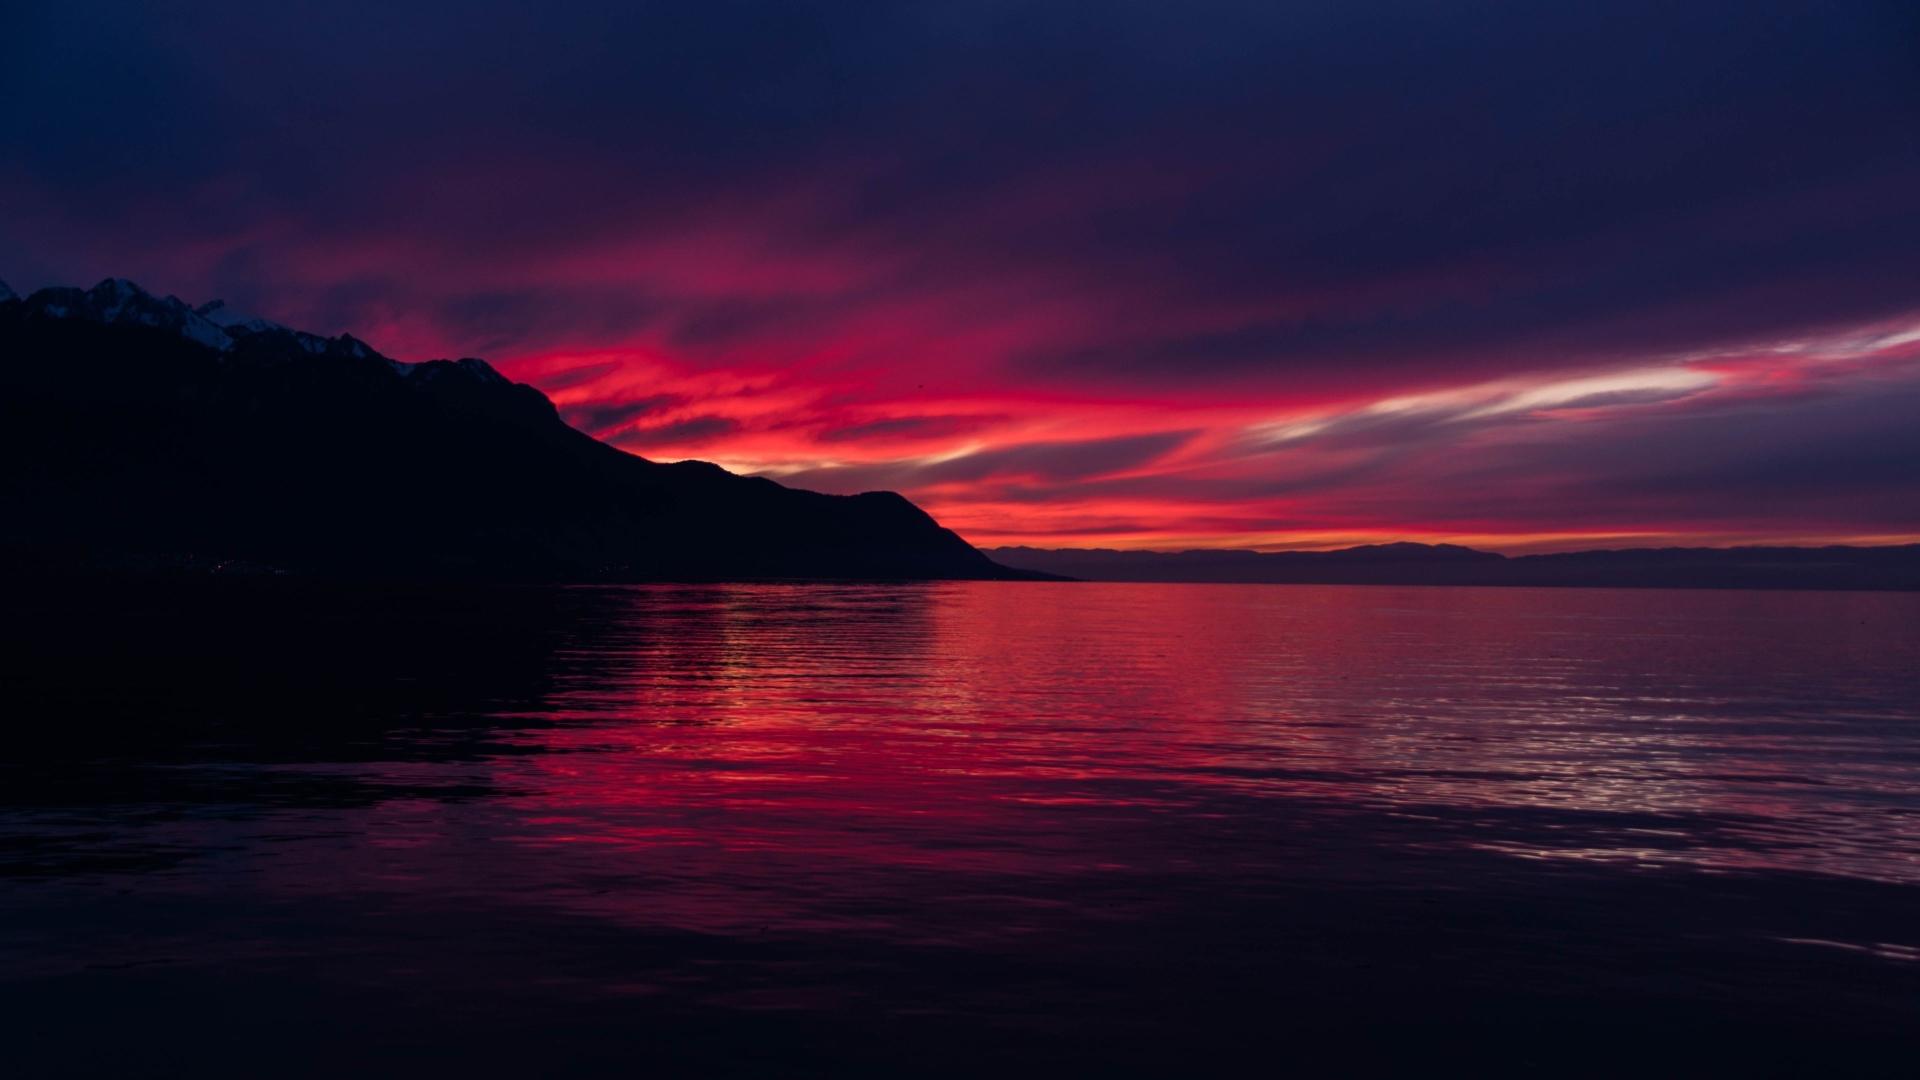 1920x1080 4k Dark Sunset 1080p Laptop Full Hd Wallpaper Hd Nature